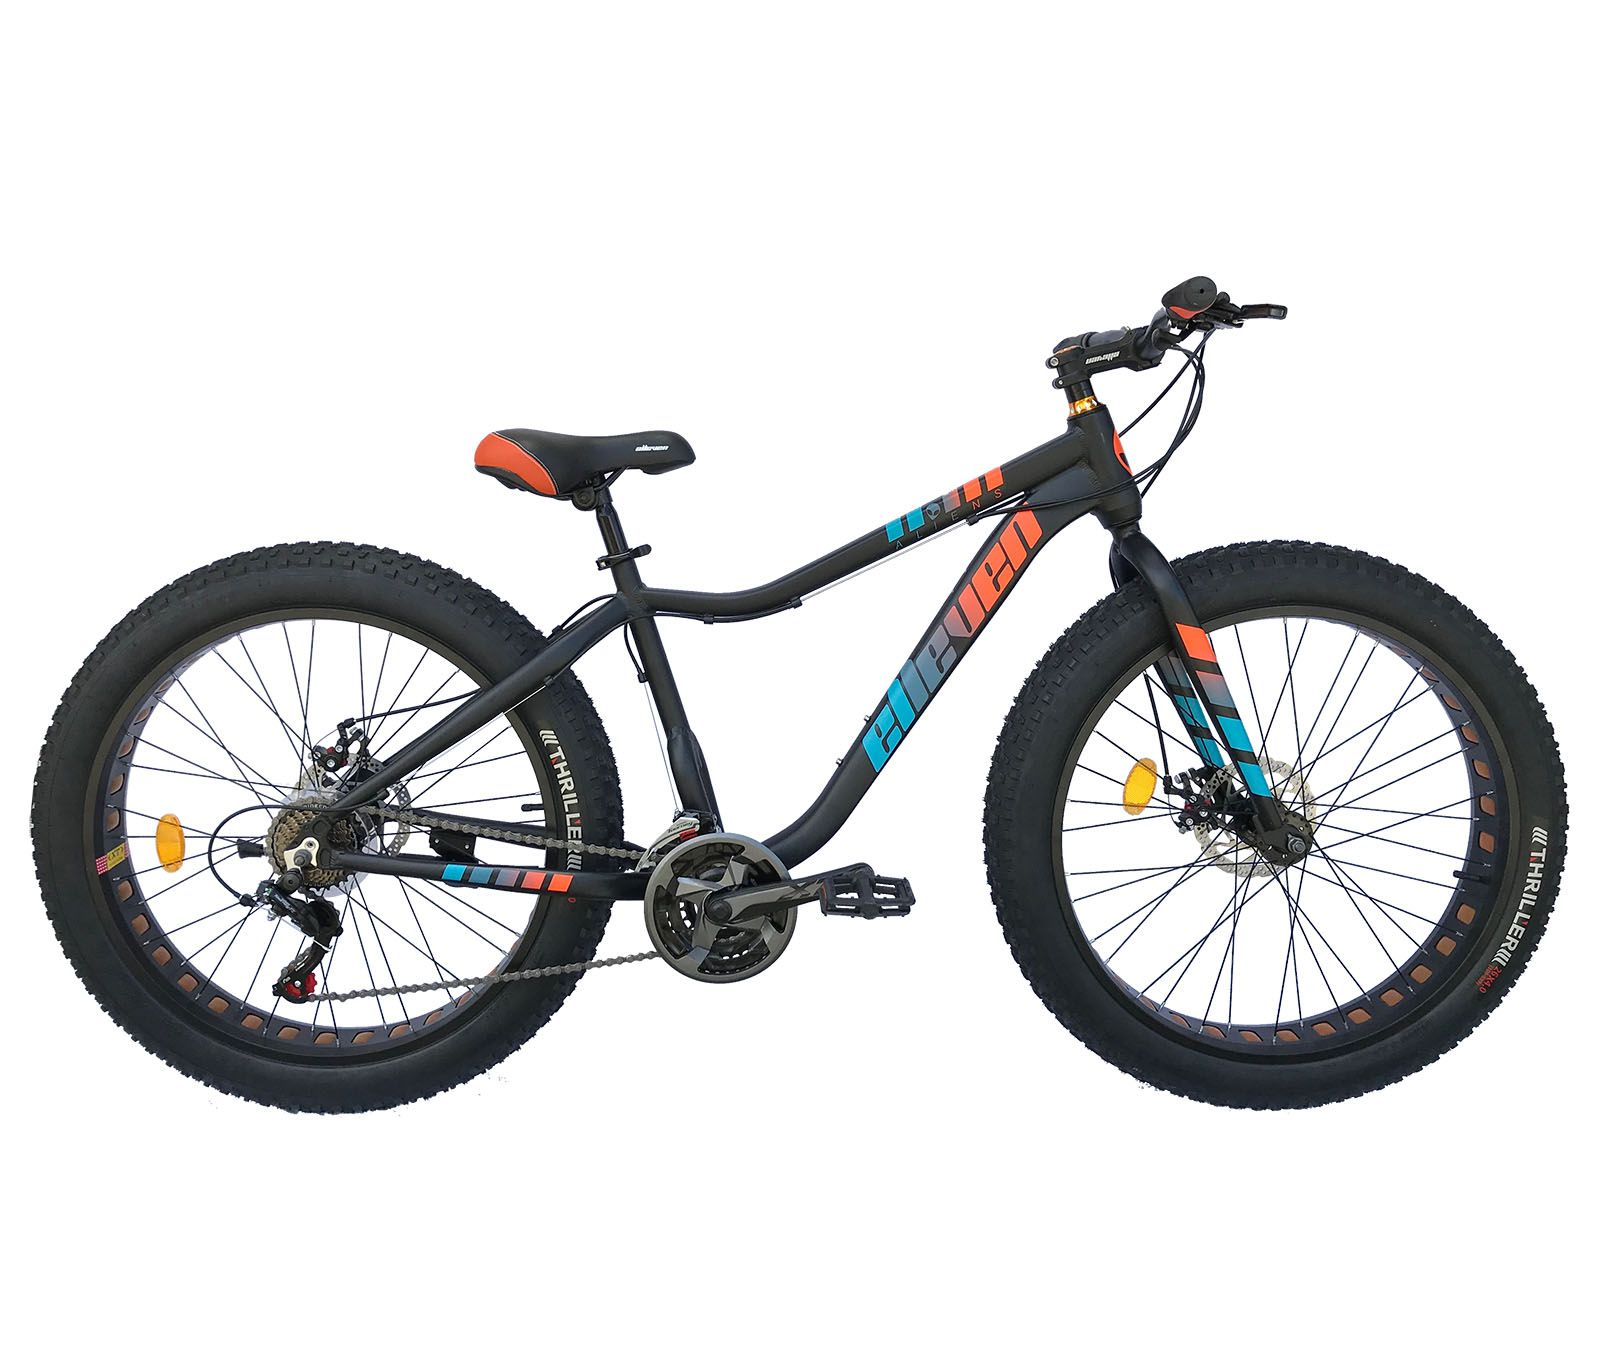 Bicicleta Aro 26 Fat Aliens 21v Elleven